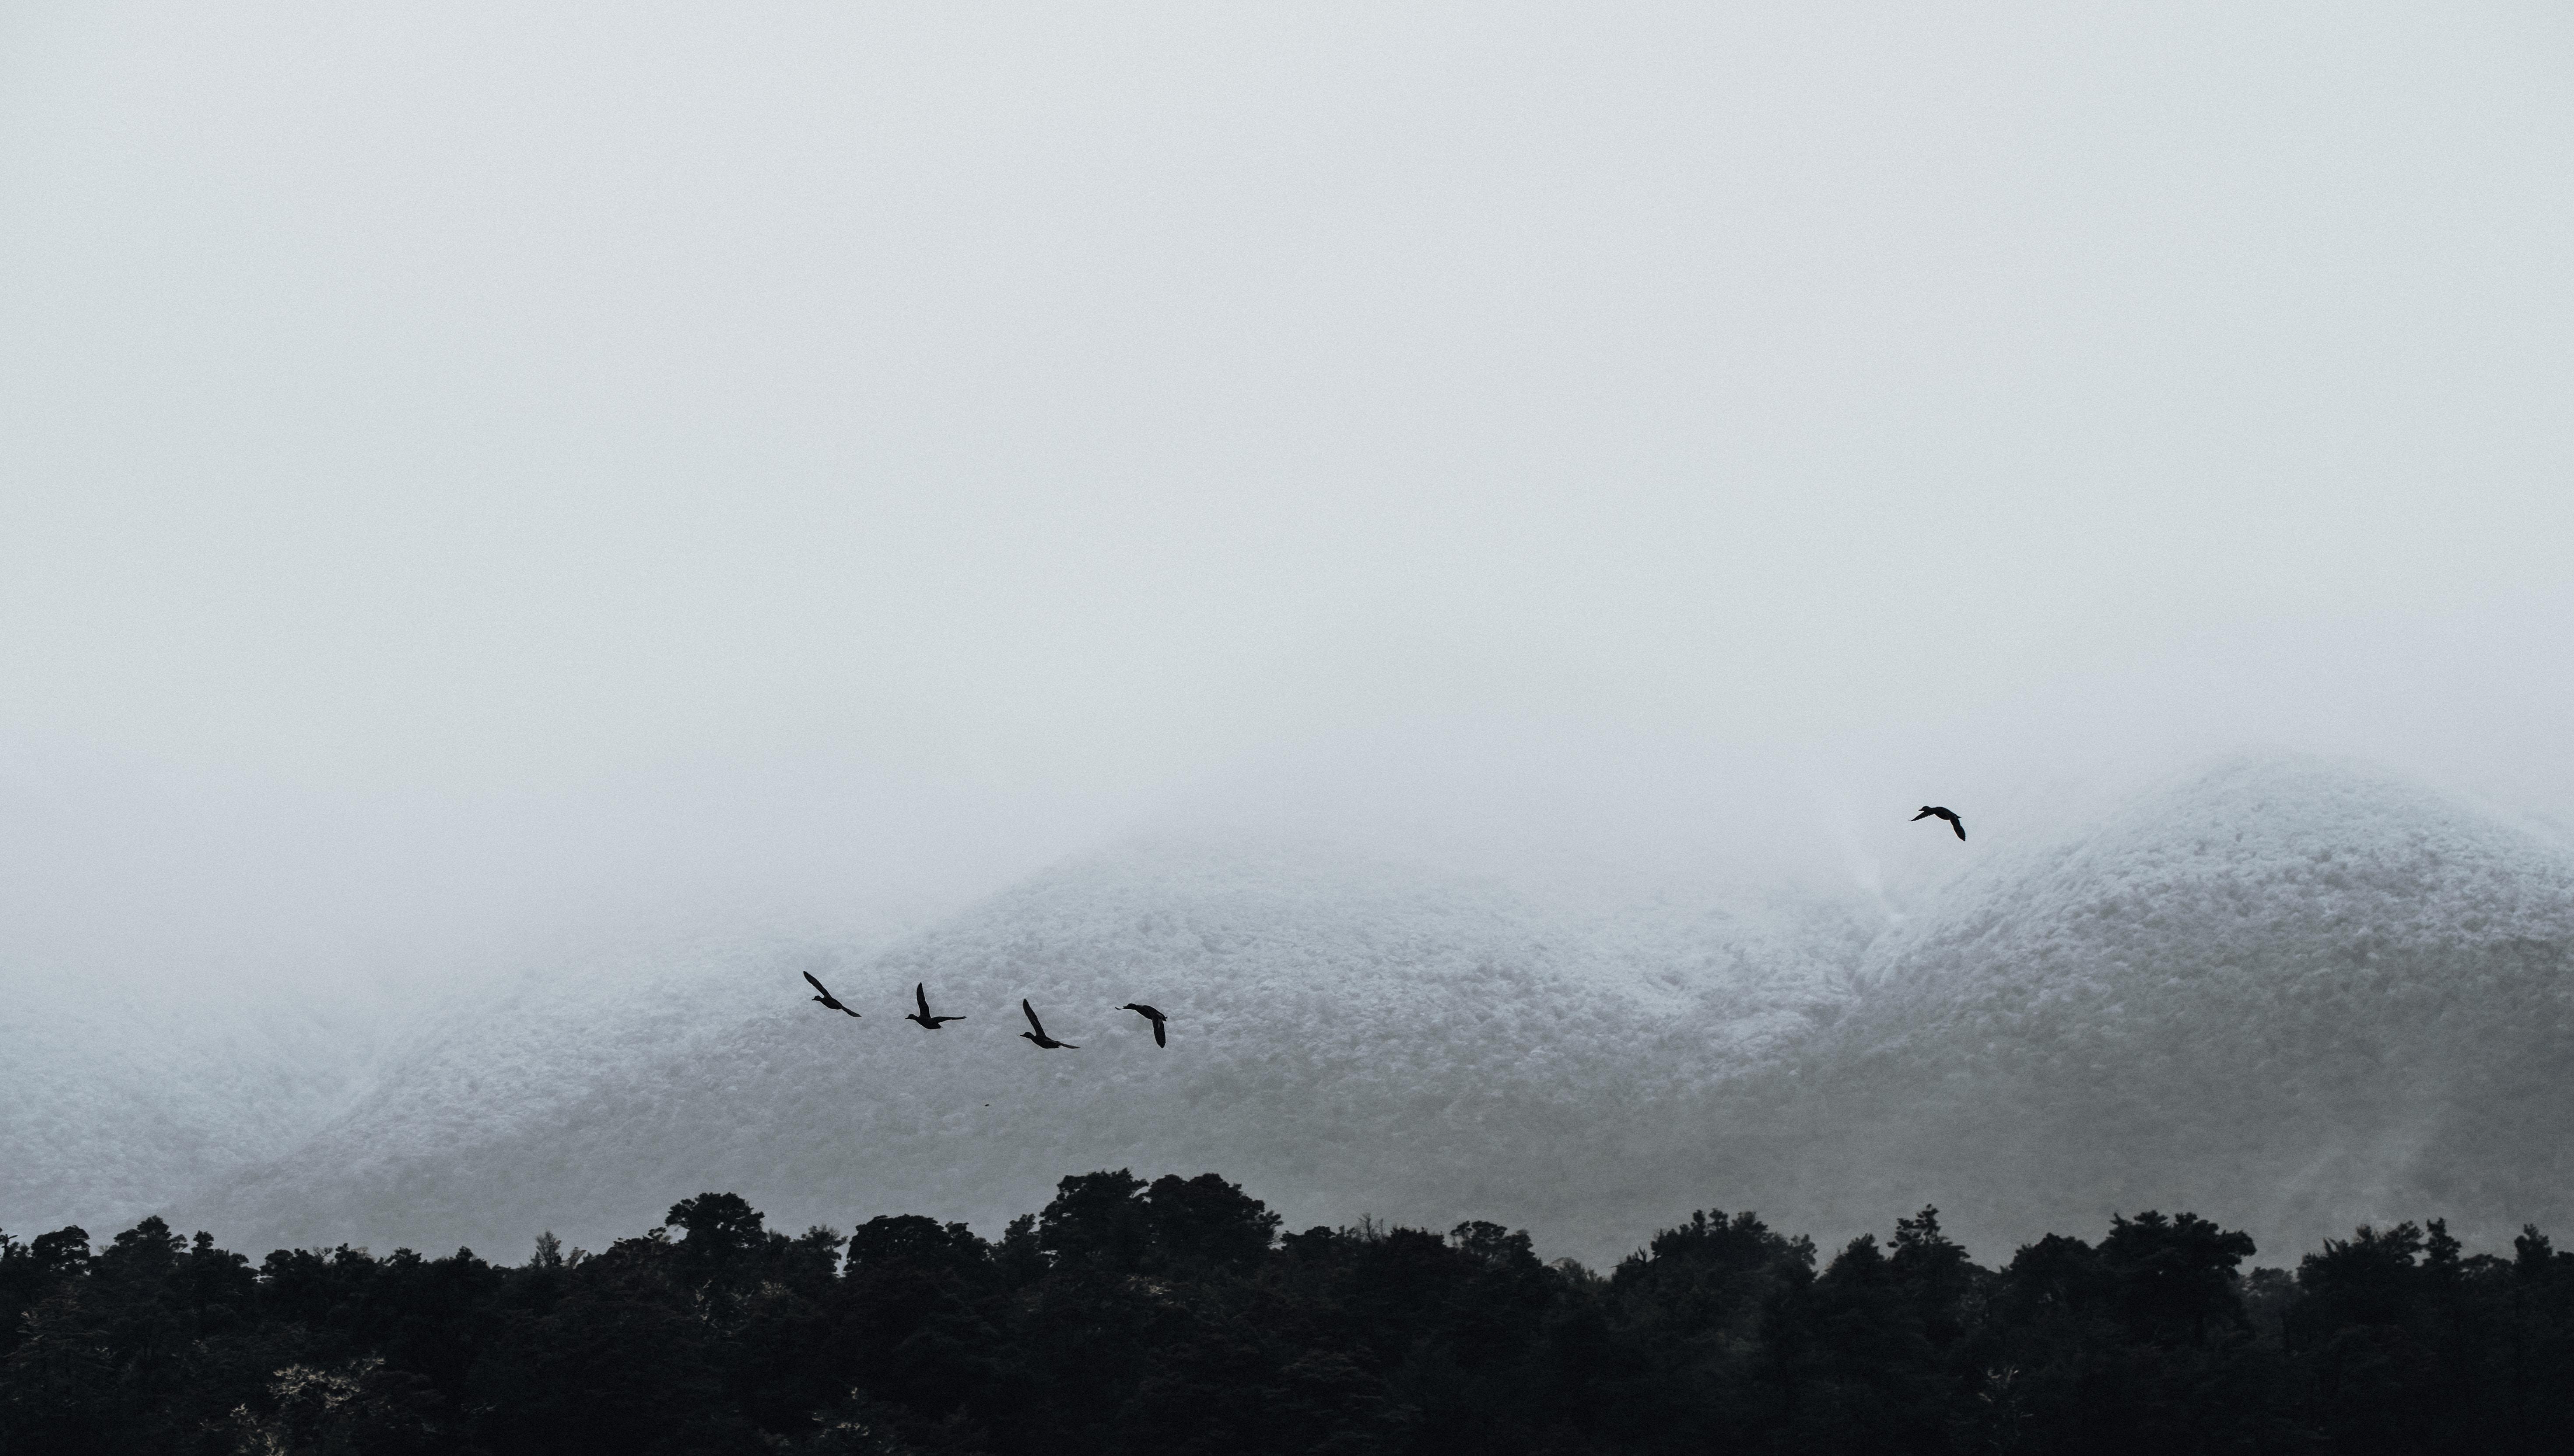 landscape photo of flying birds